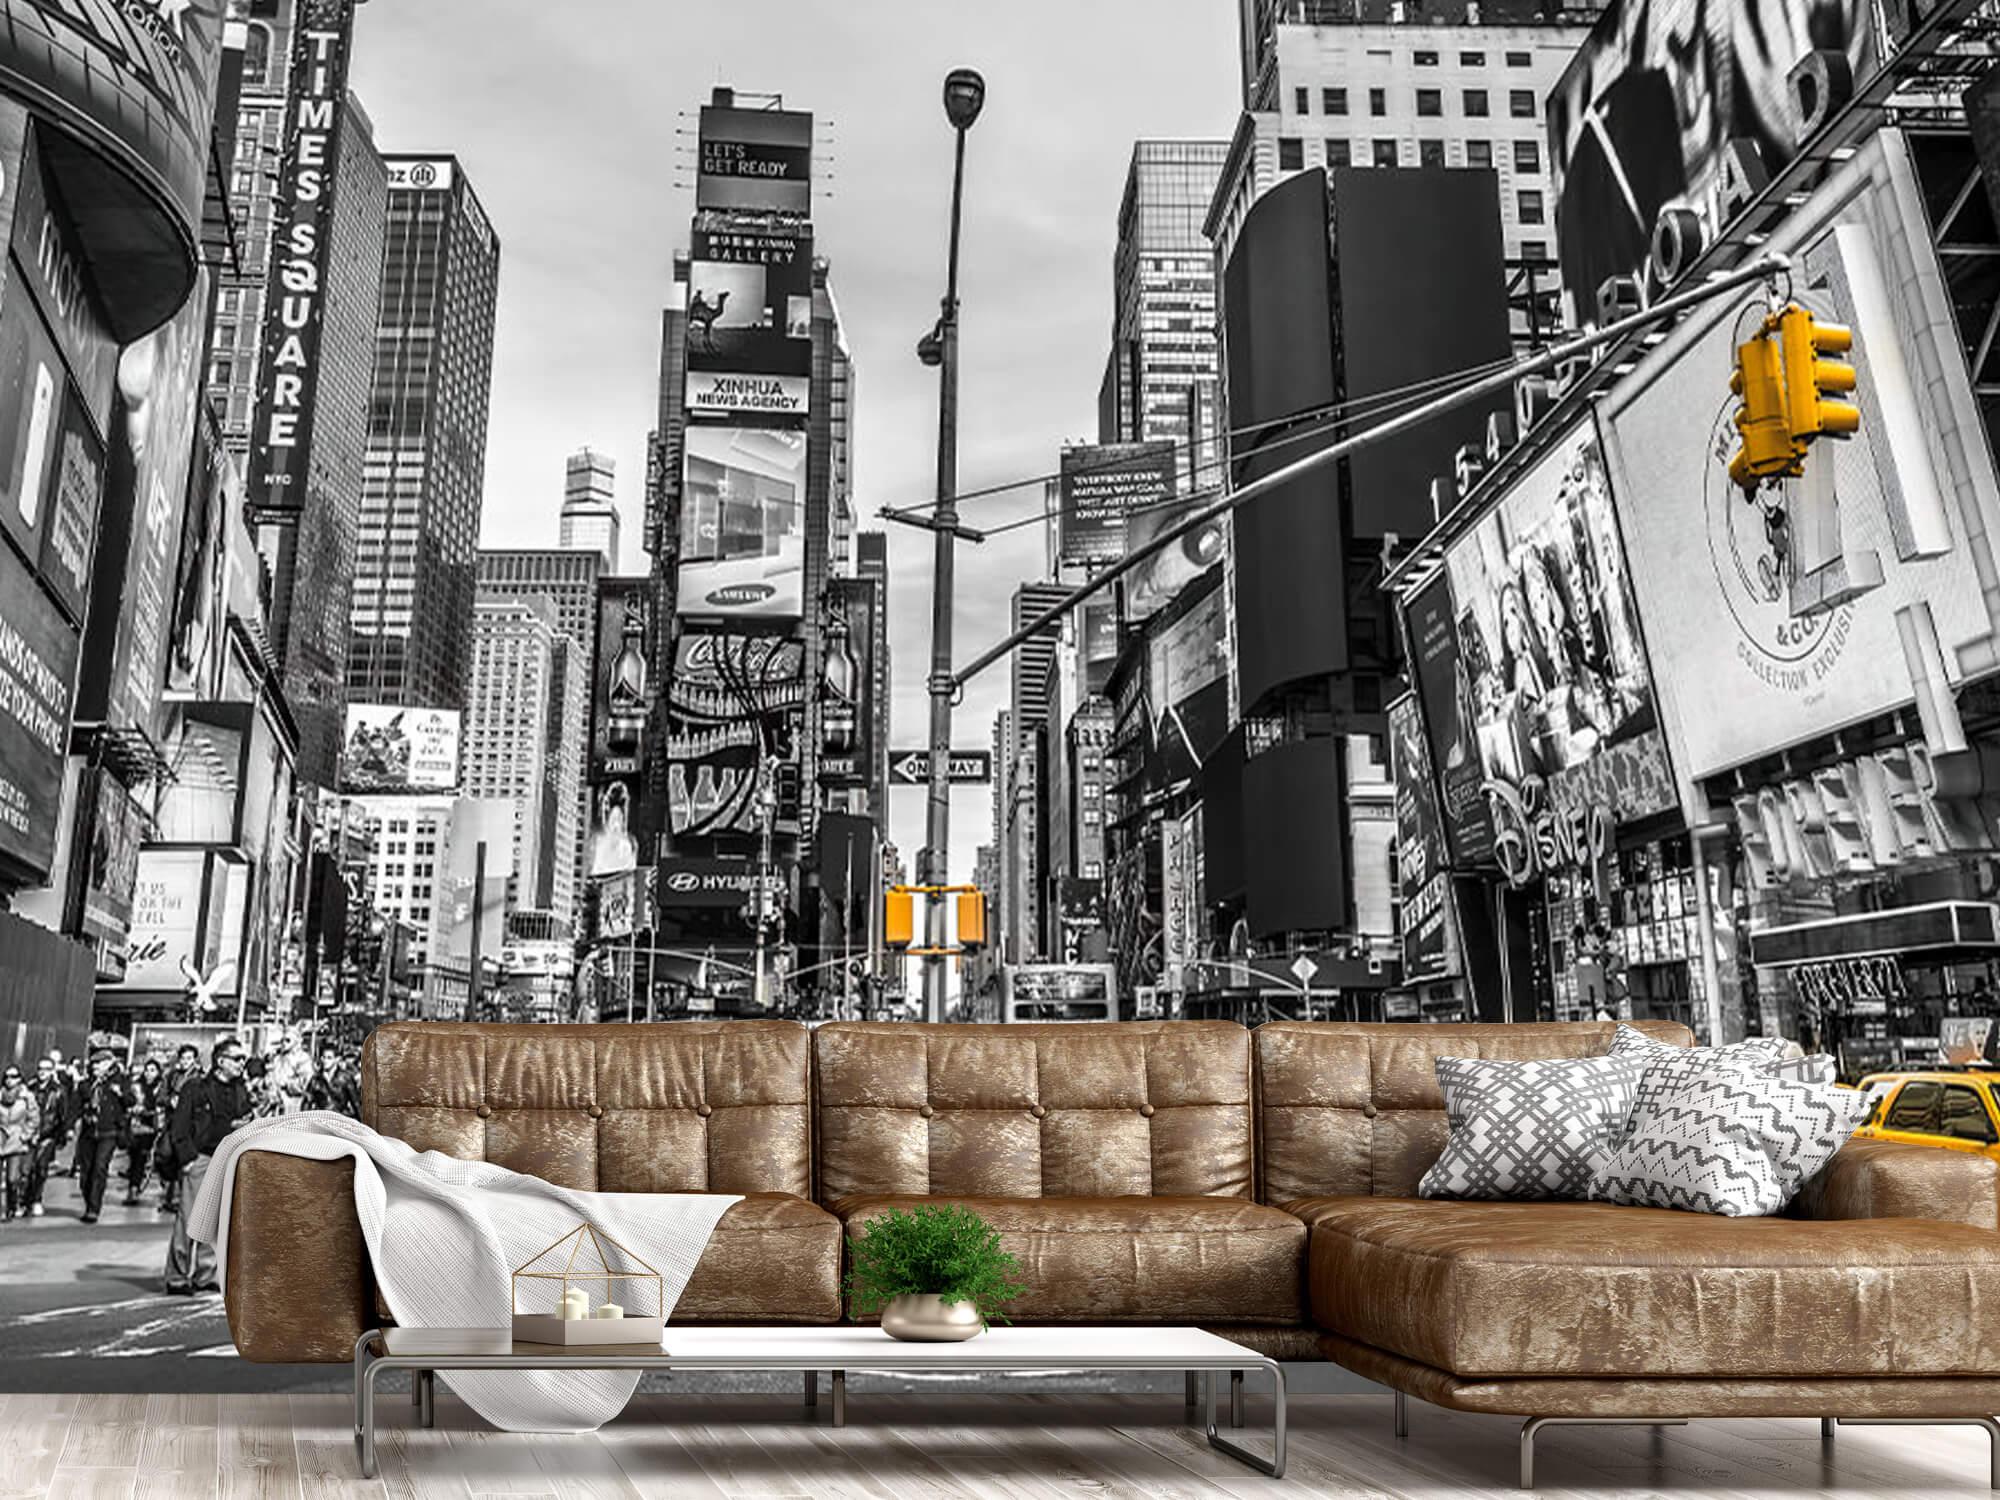 Broadway Times Square 11